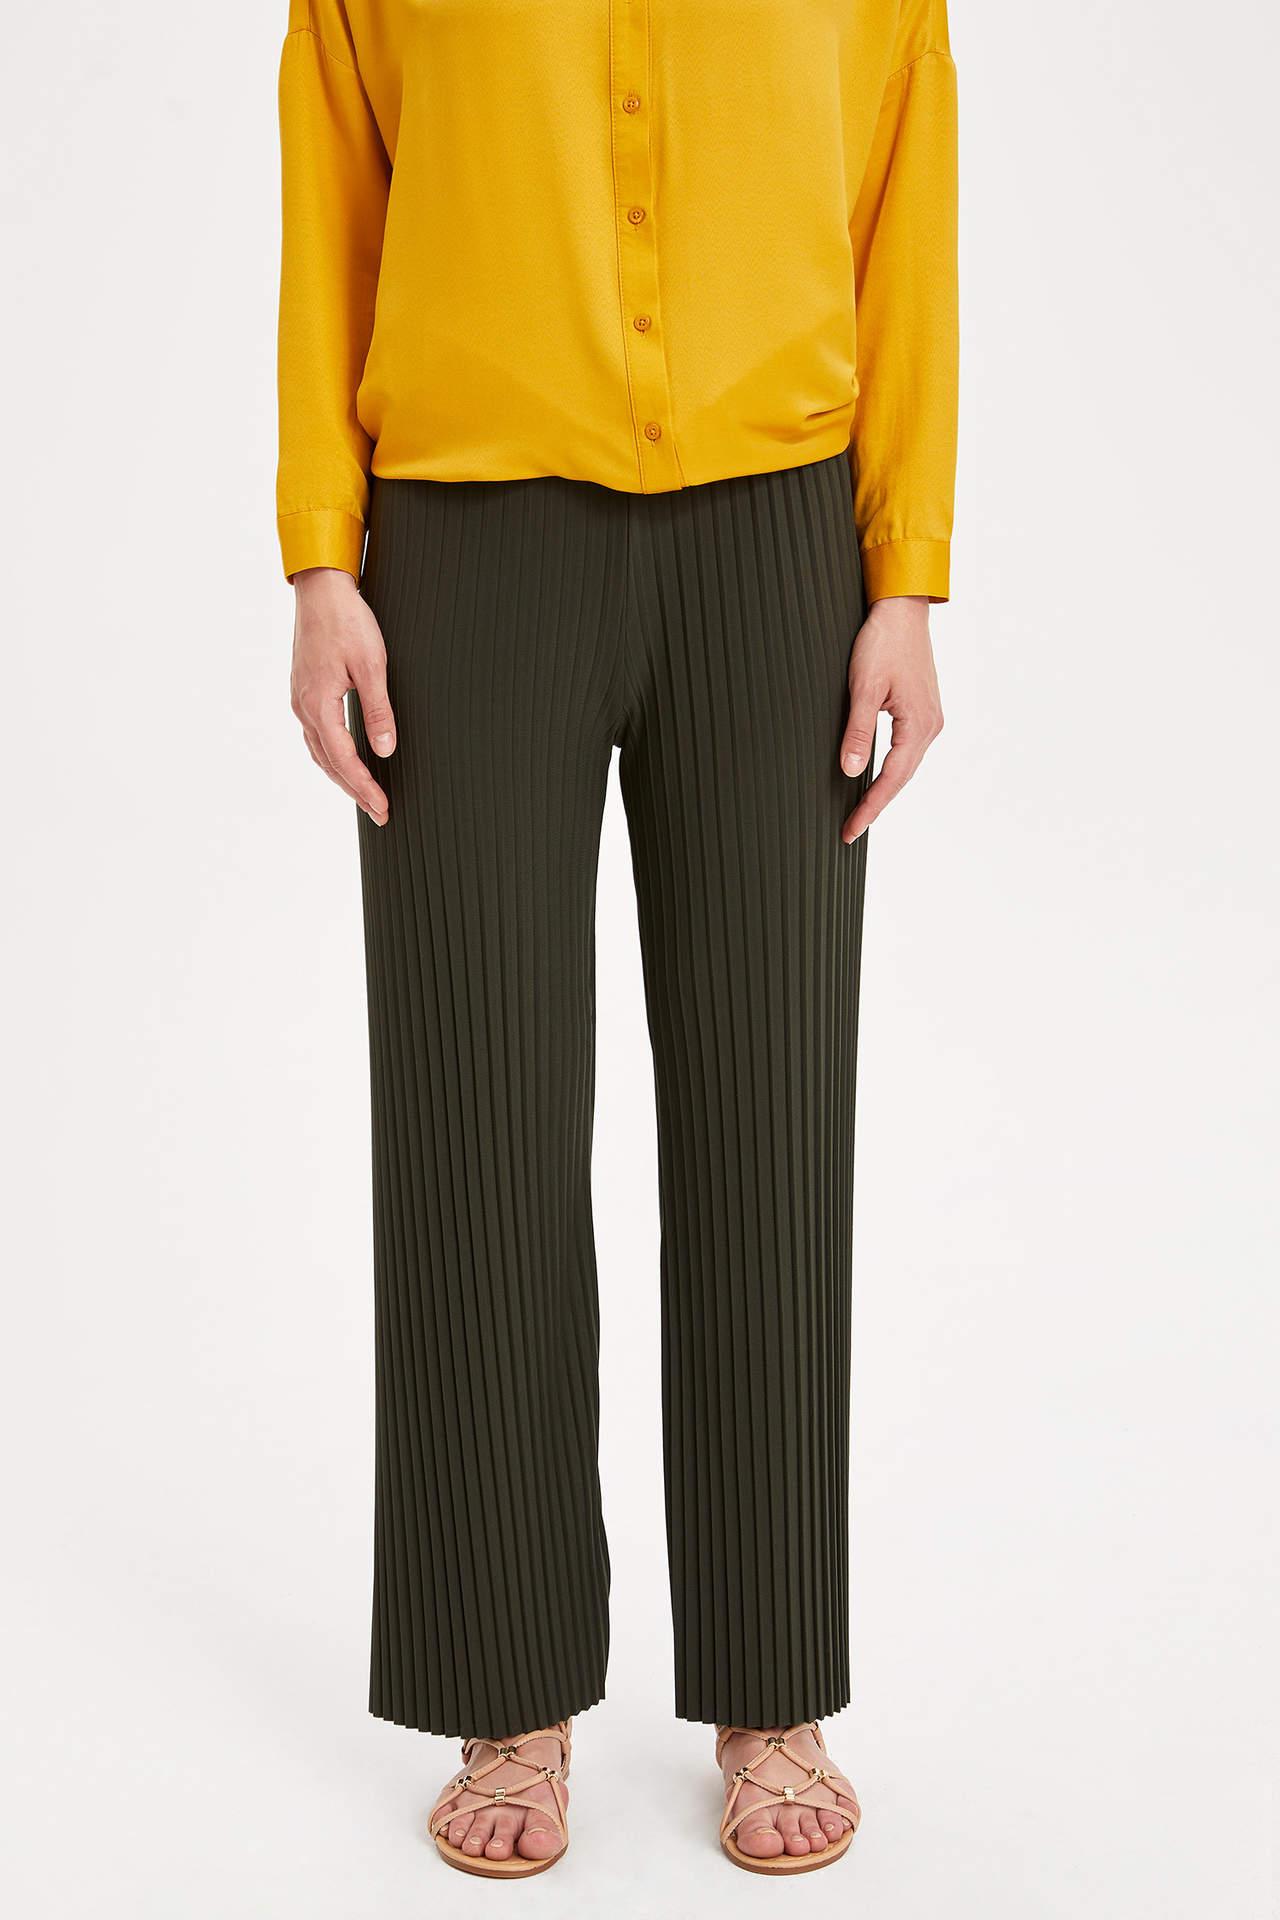 Defacto Kadın Çizgili Pantolon